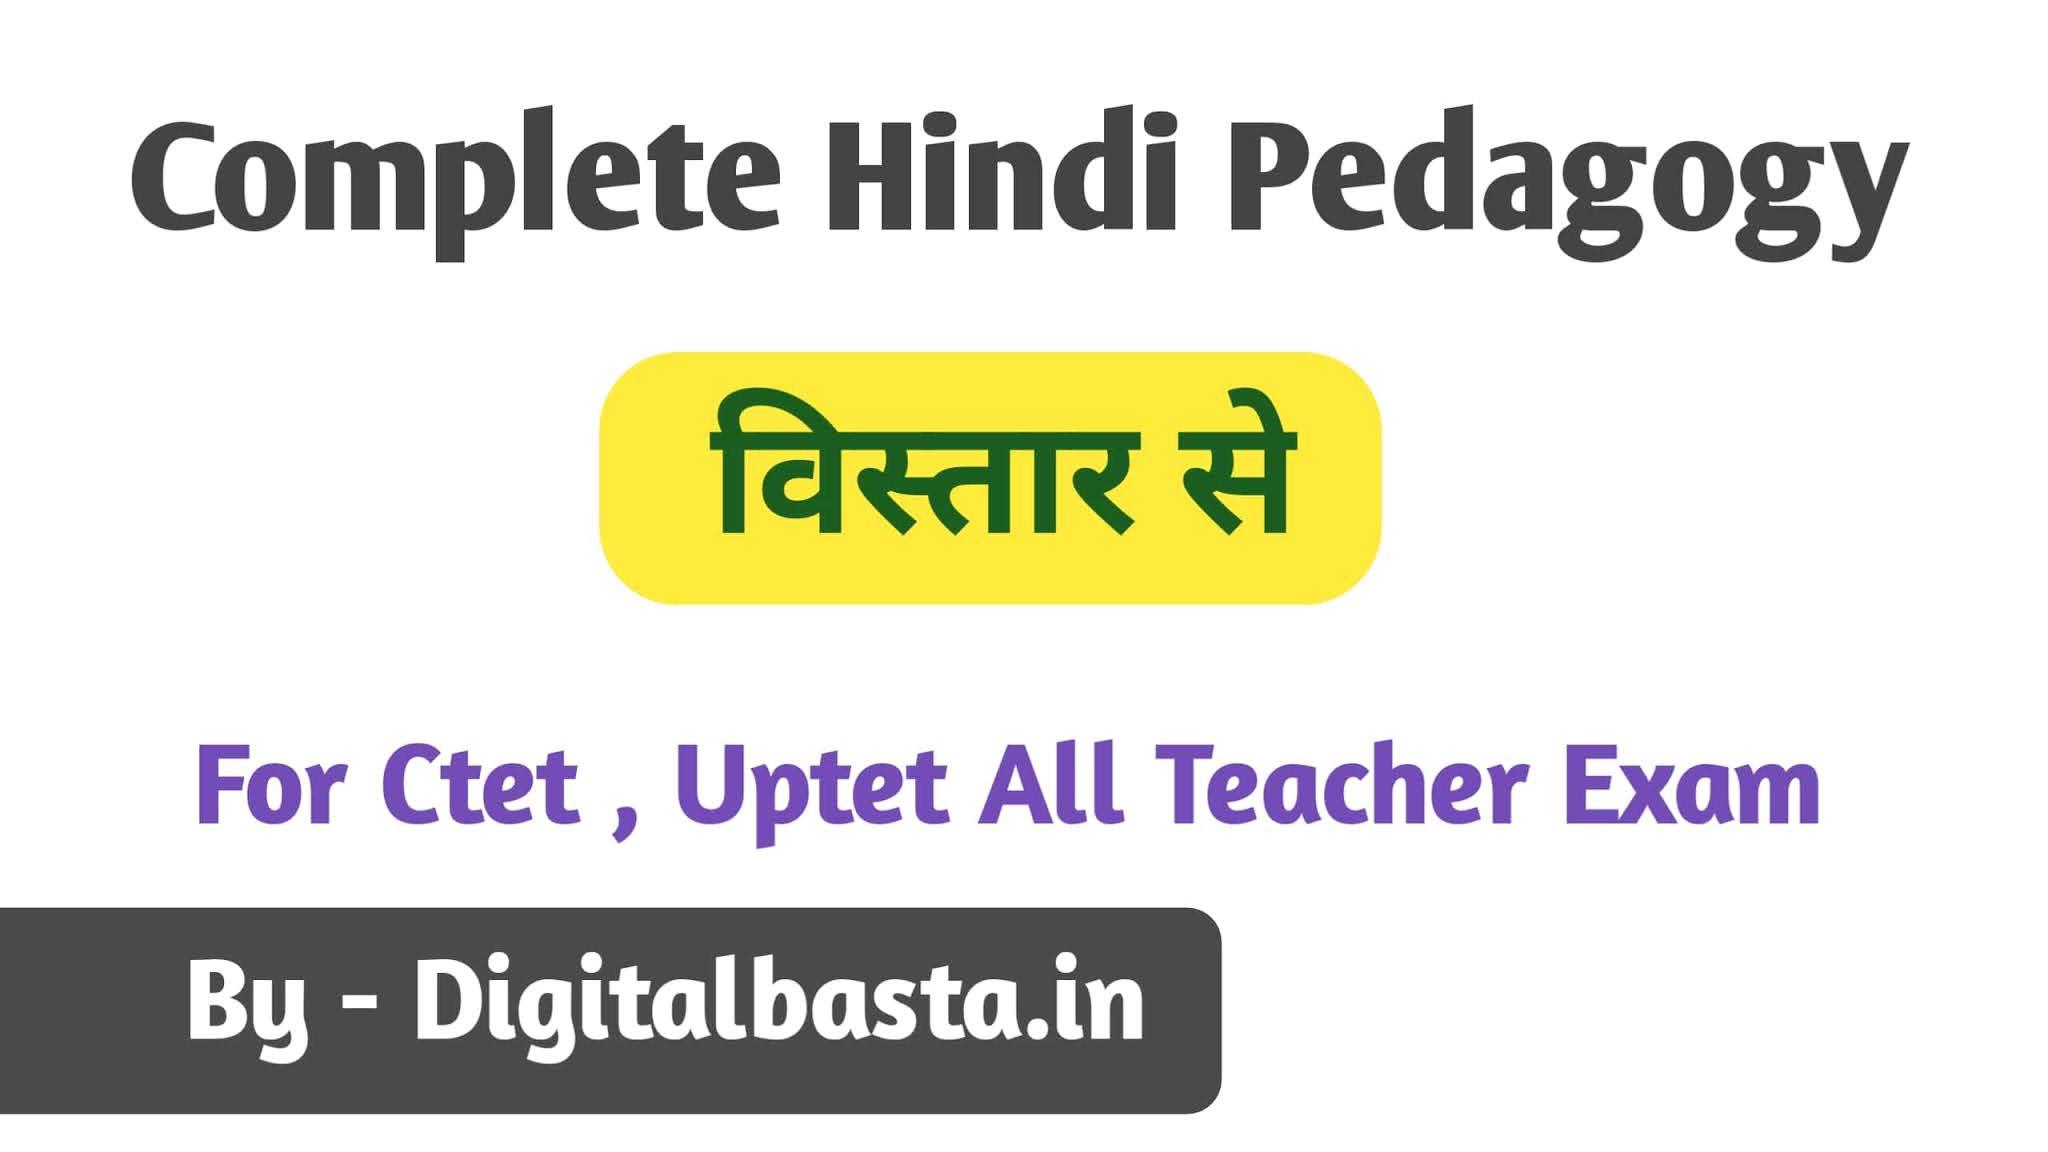 Complete Hindi Pedagogy Nots For Ctet , Uptet , Tet And All Teachers Exam